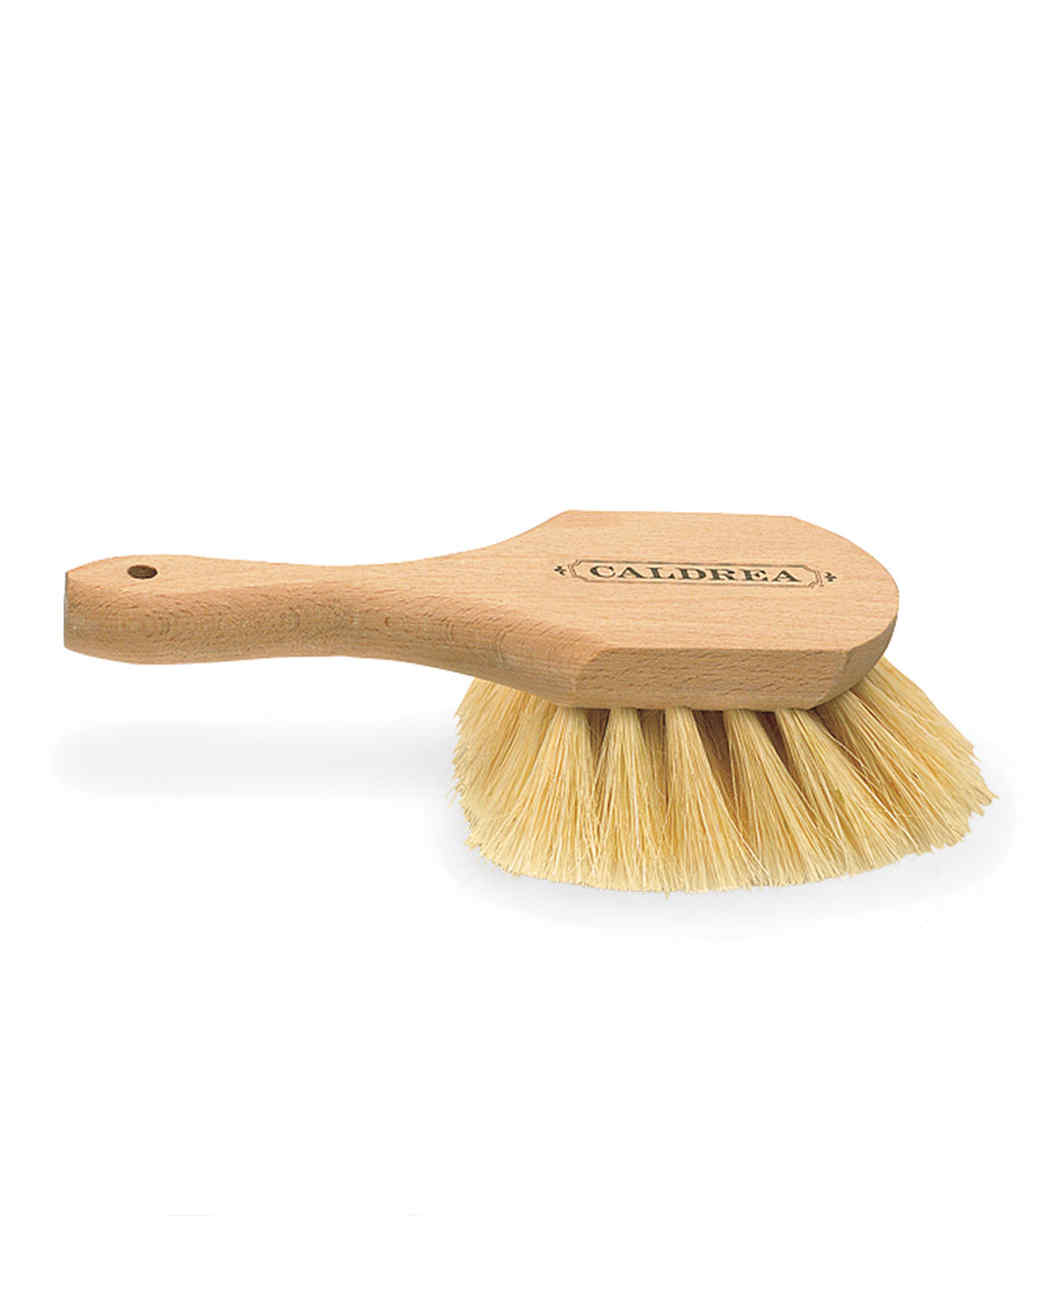 mls106136_scrubbrush.jpg